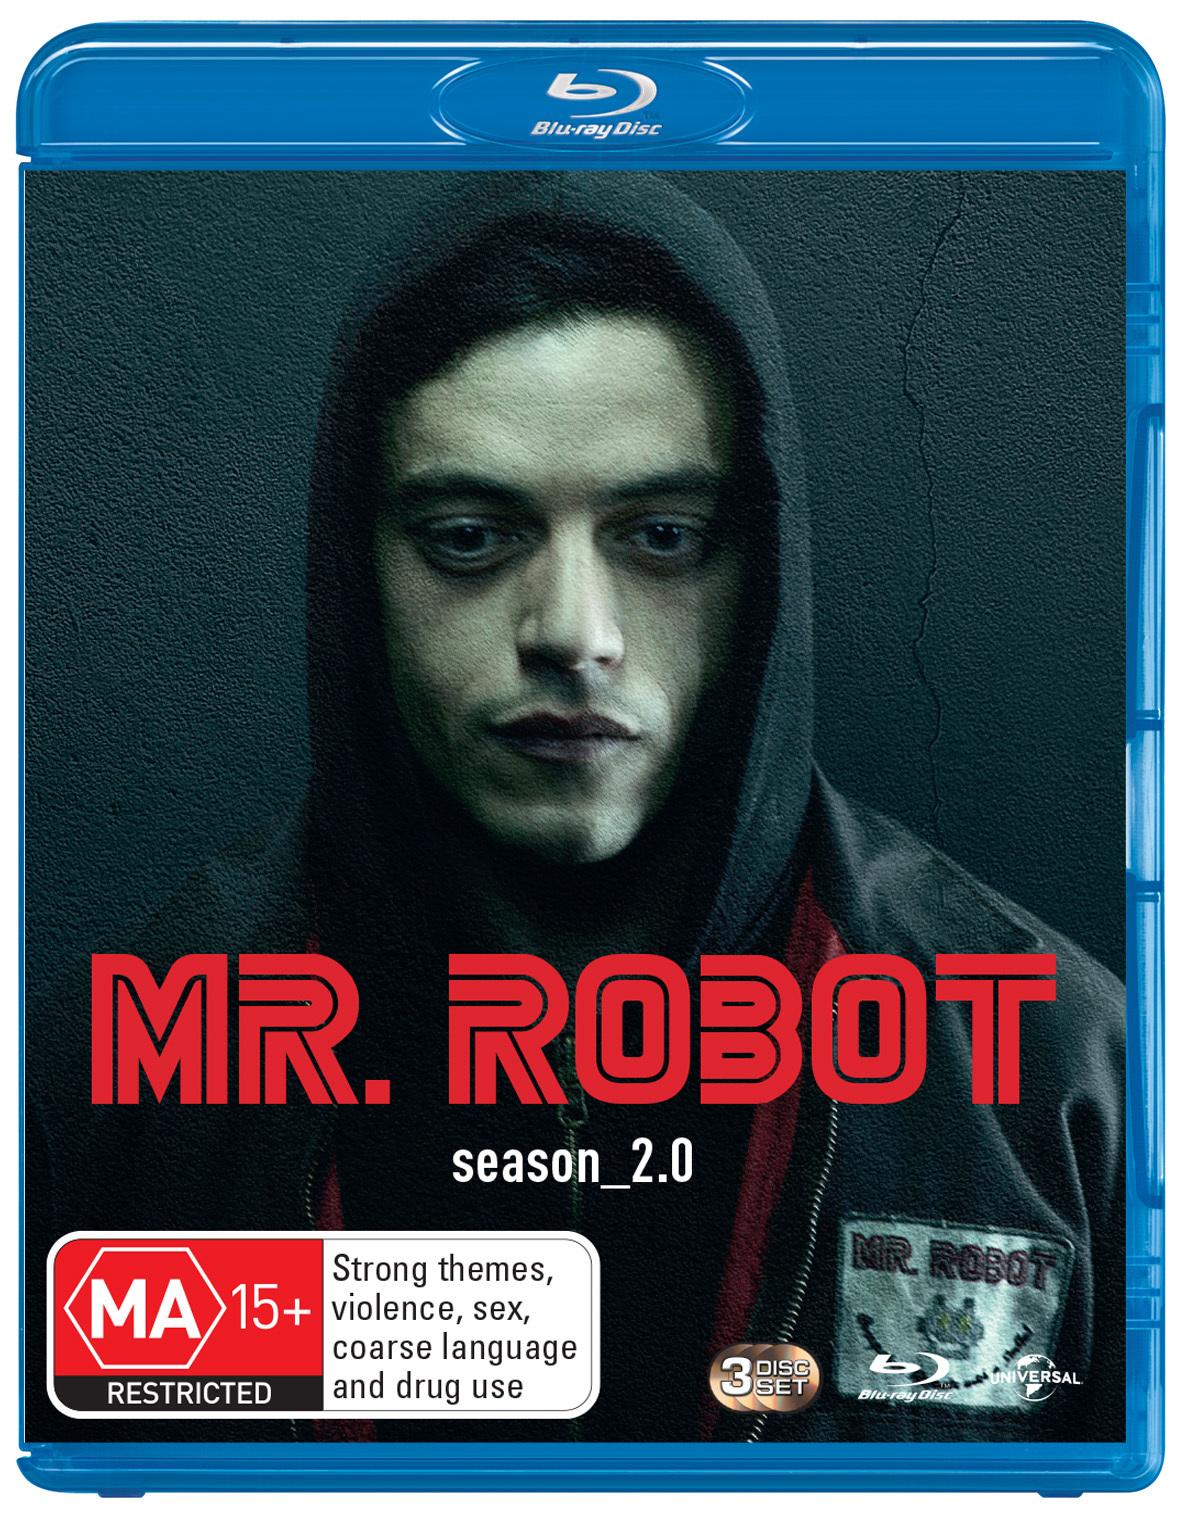 Mr. Robot - Season_2.0 on Blu-ray image